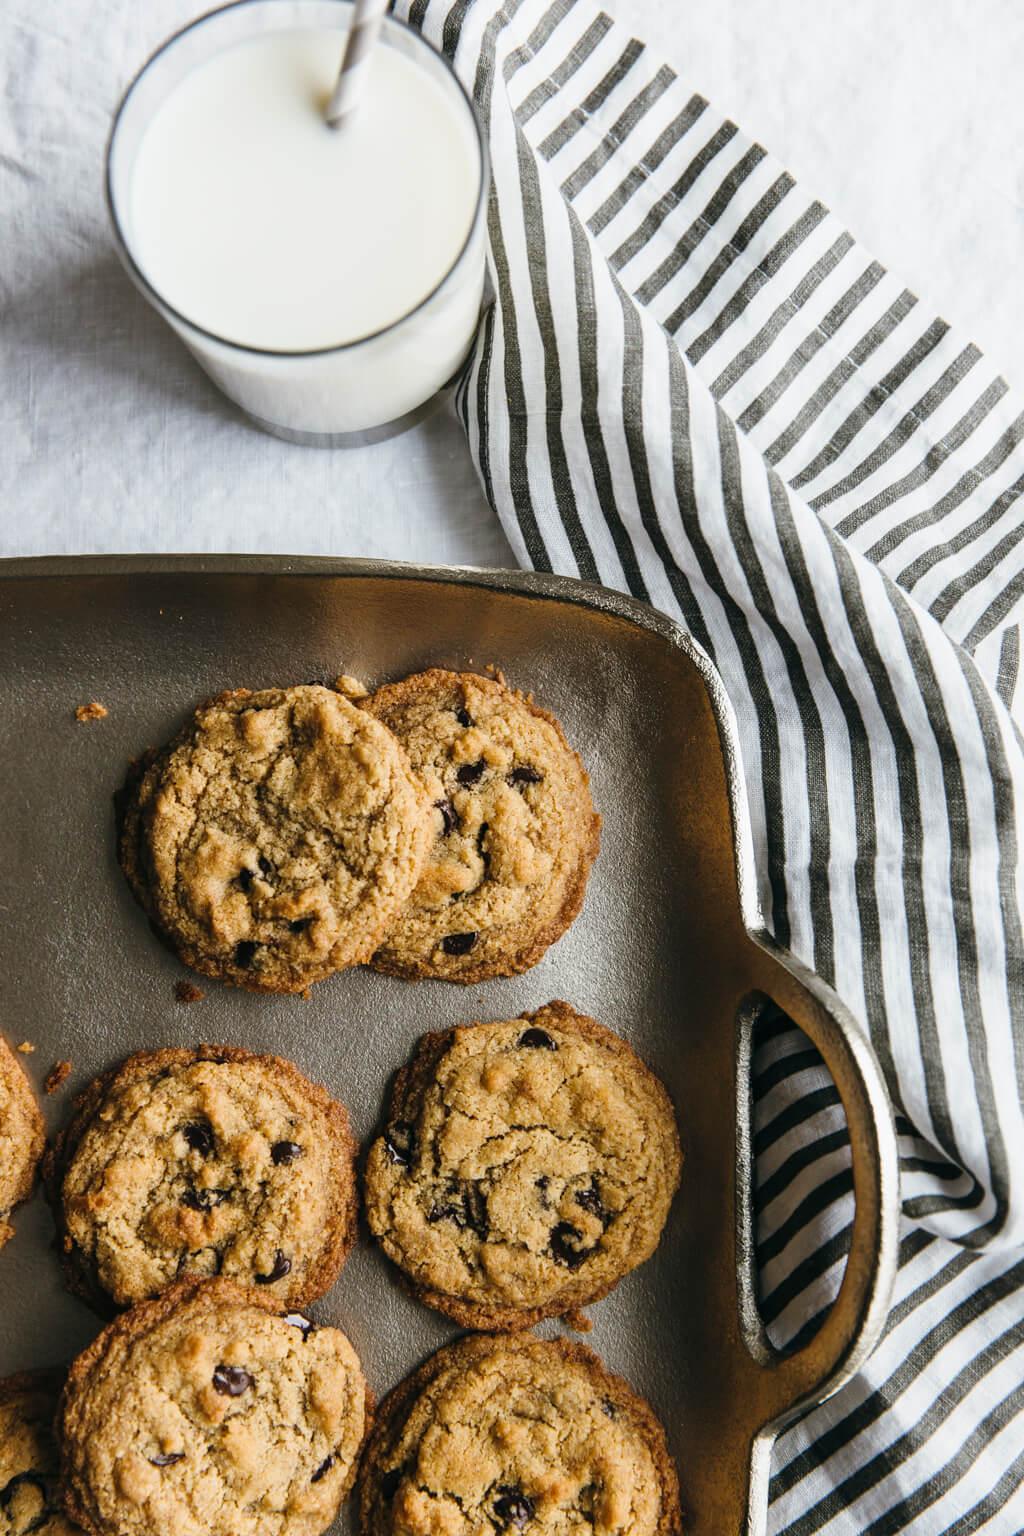 The Best Chocolate Chip Cookies Paleo Vegan Gluten Free